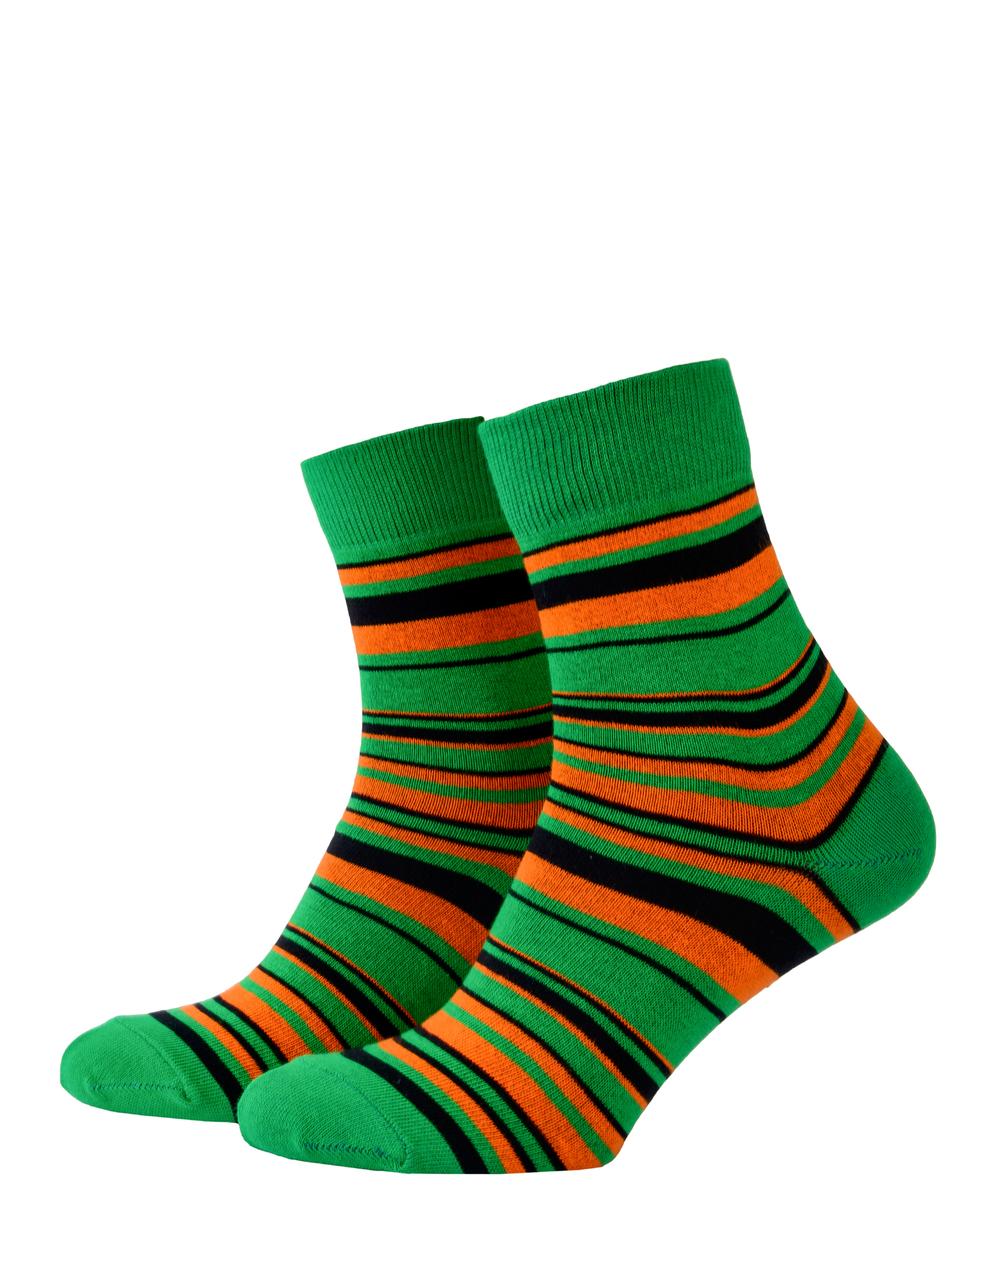 Носки Mushka Deep Green (DEE001) 41-45